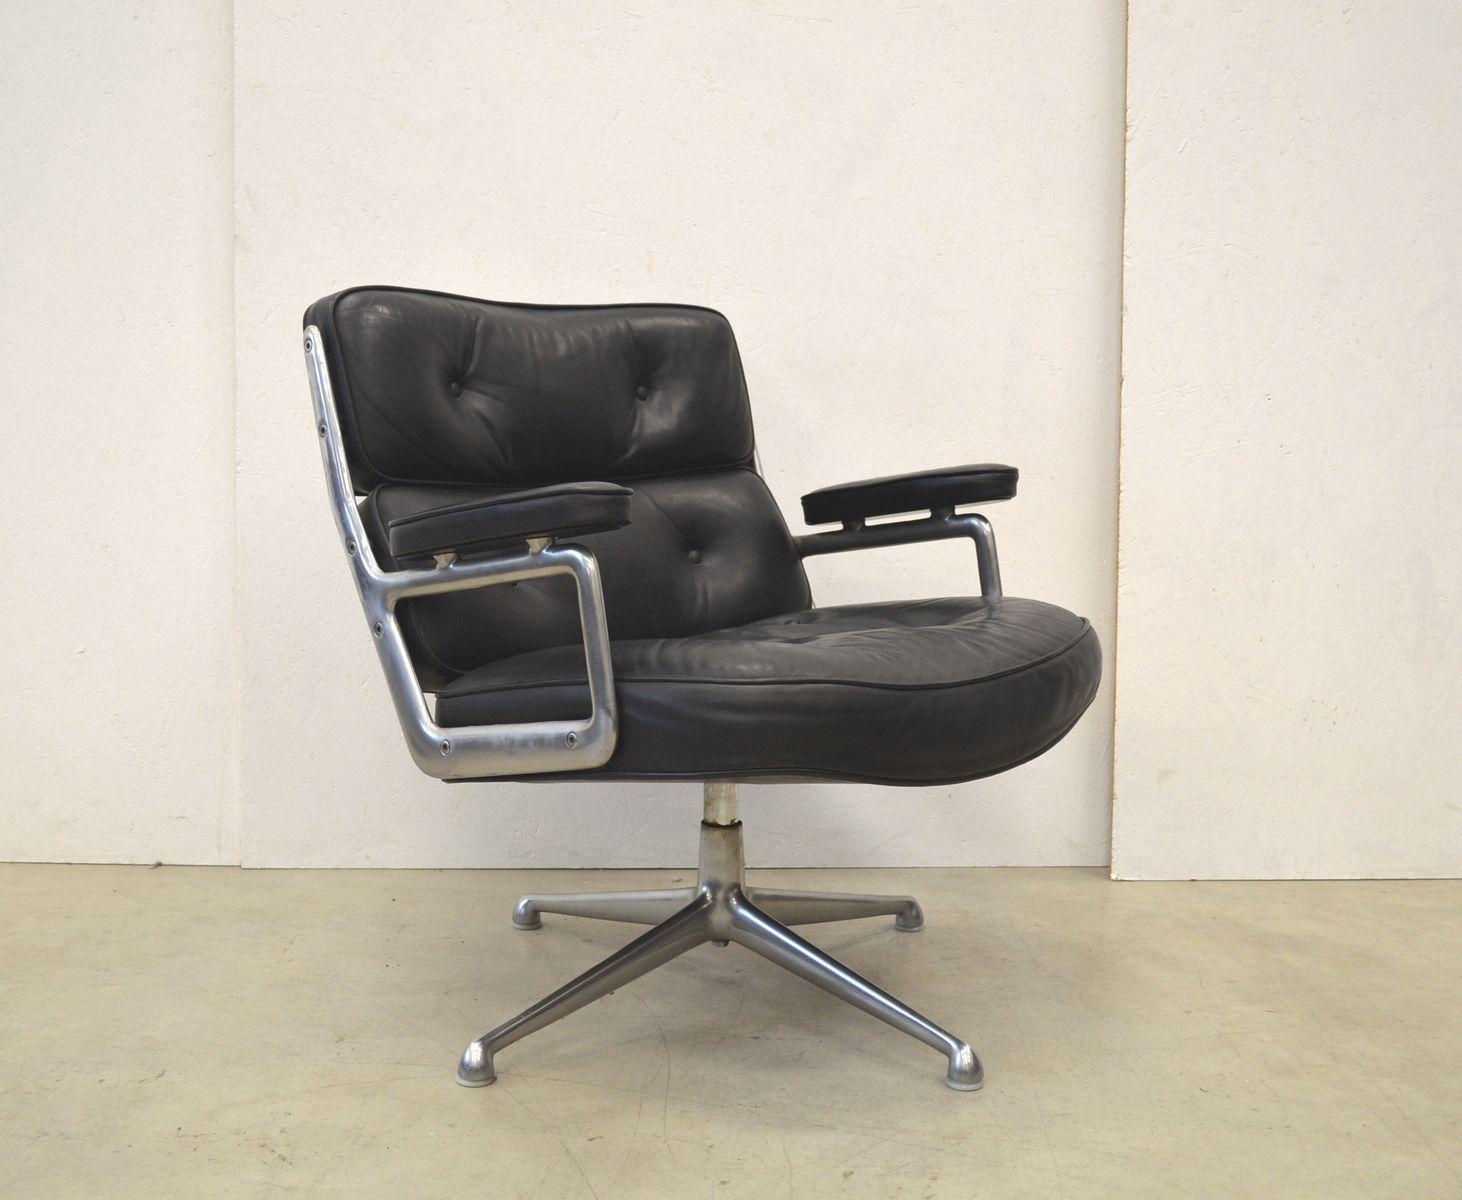 amerikanischer modell es105 lobby sessel von charles ray. Black Bedroom Furniture Sets. Home Design Ideas